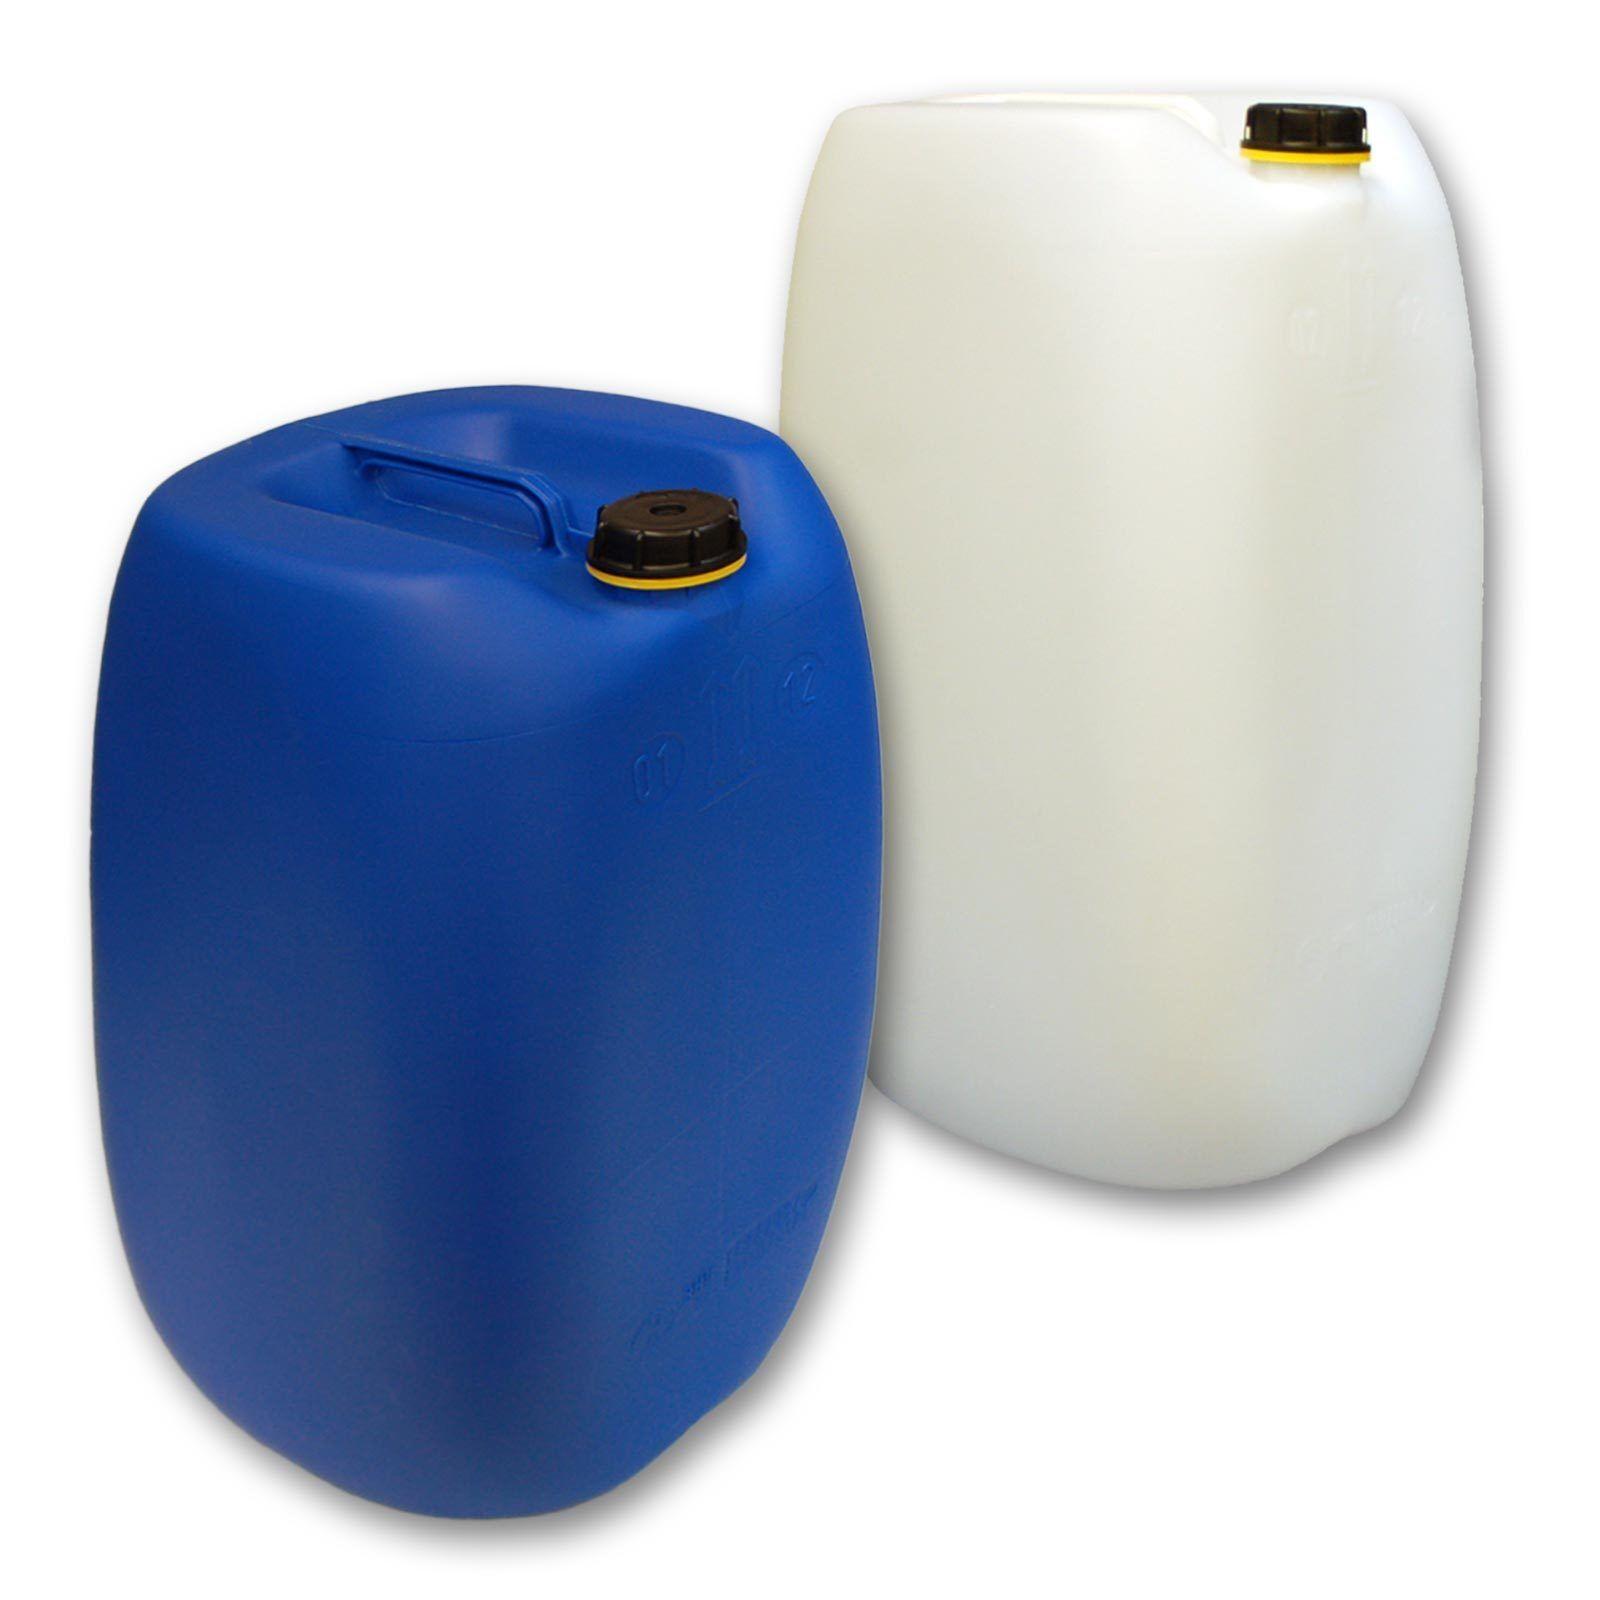 Wasserkanister Wasserkanister Wasserkanister 5 bis 60 L Camping Kiste Wasserbehälter Kanister lebensmittelecht 33db59